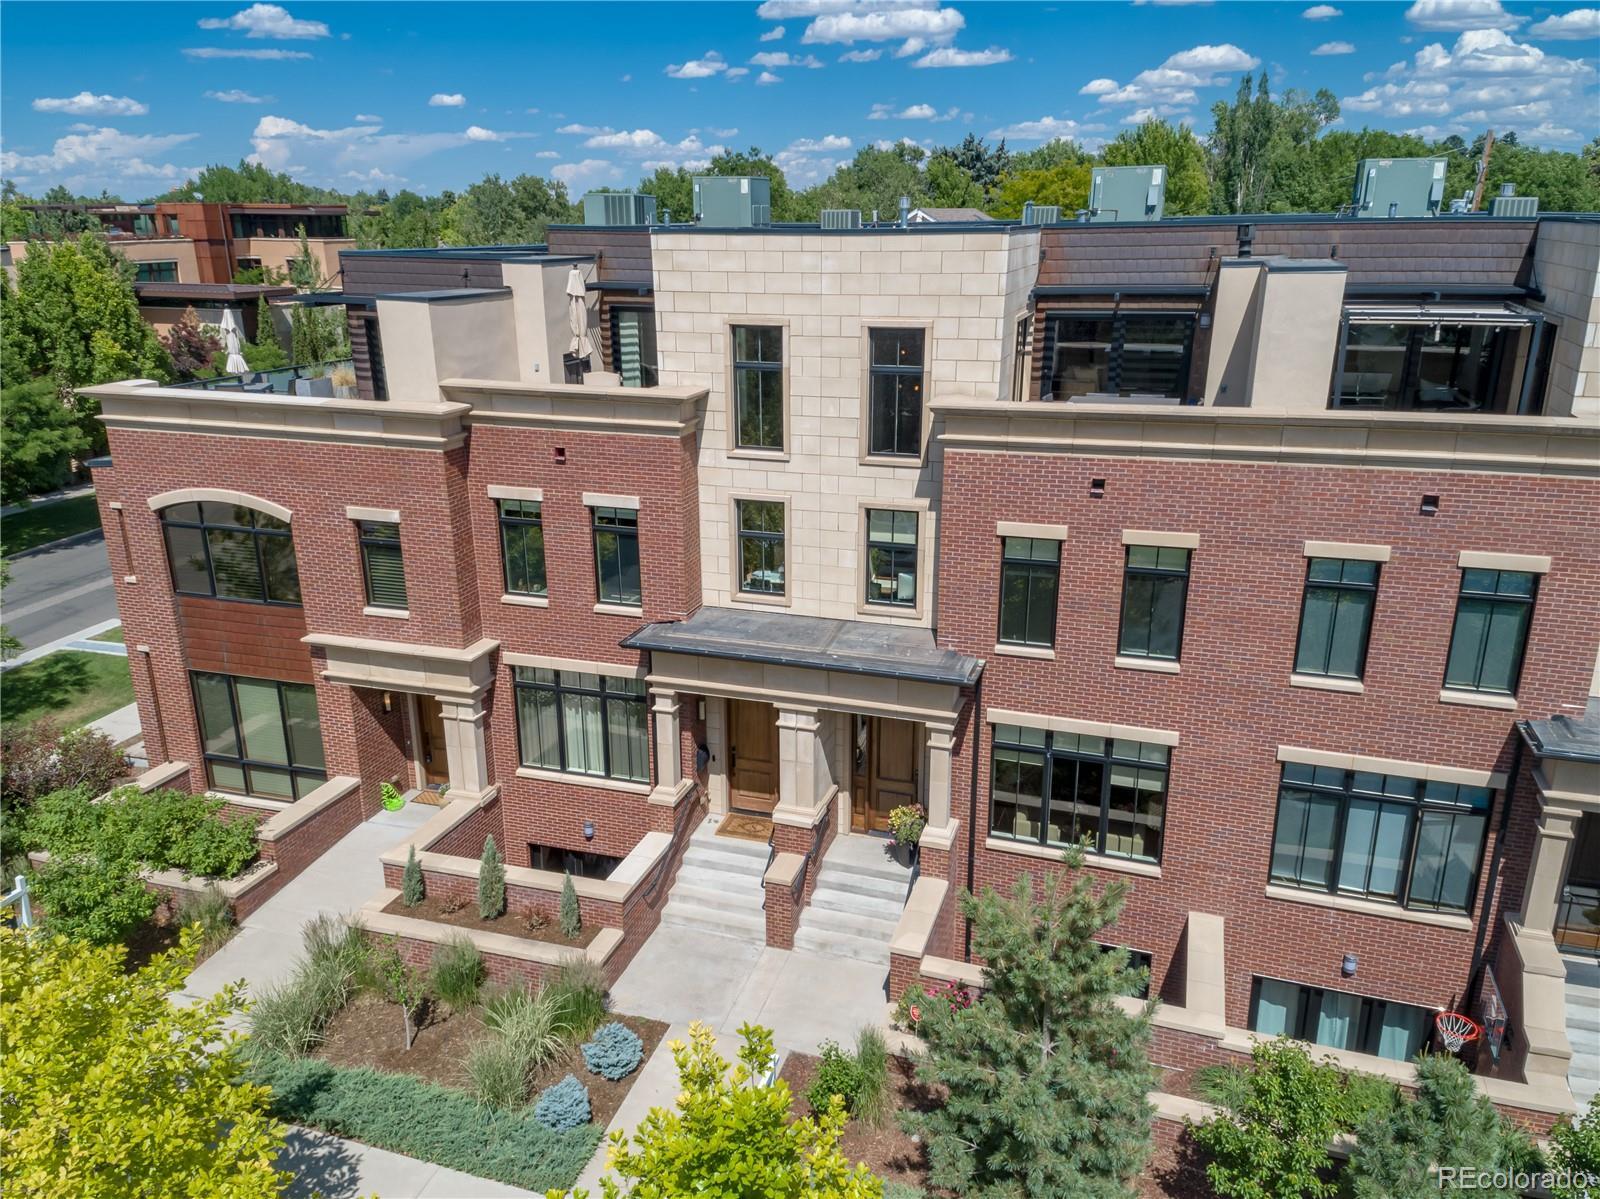 368 Garfield Property Photo - Denver, CO real estate listing